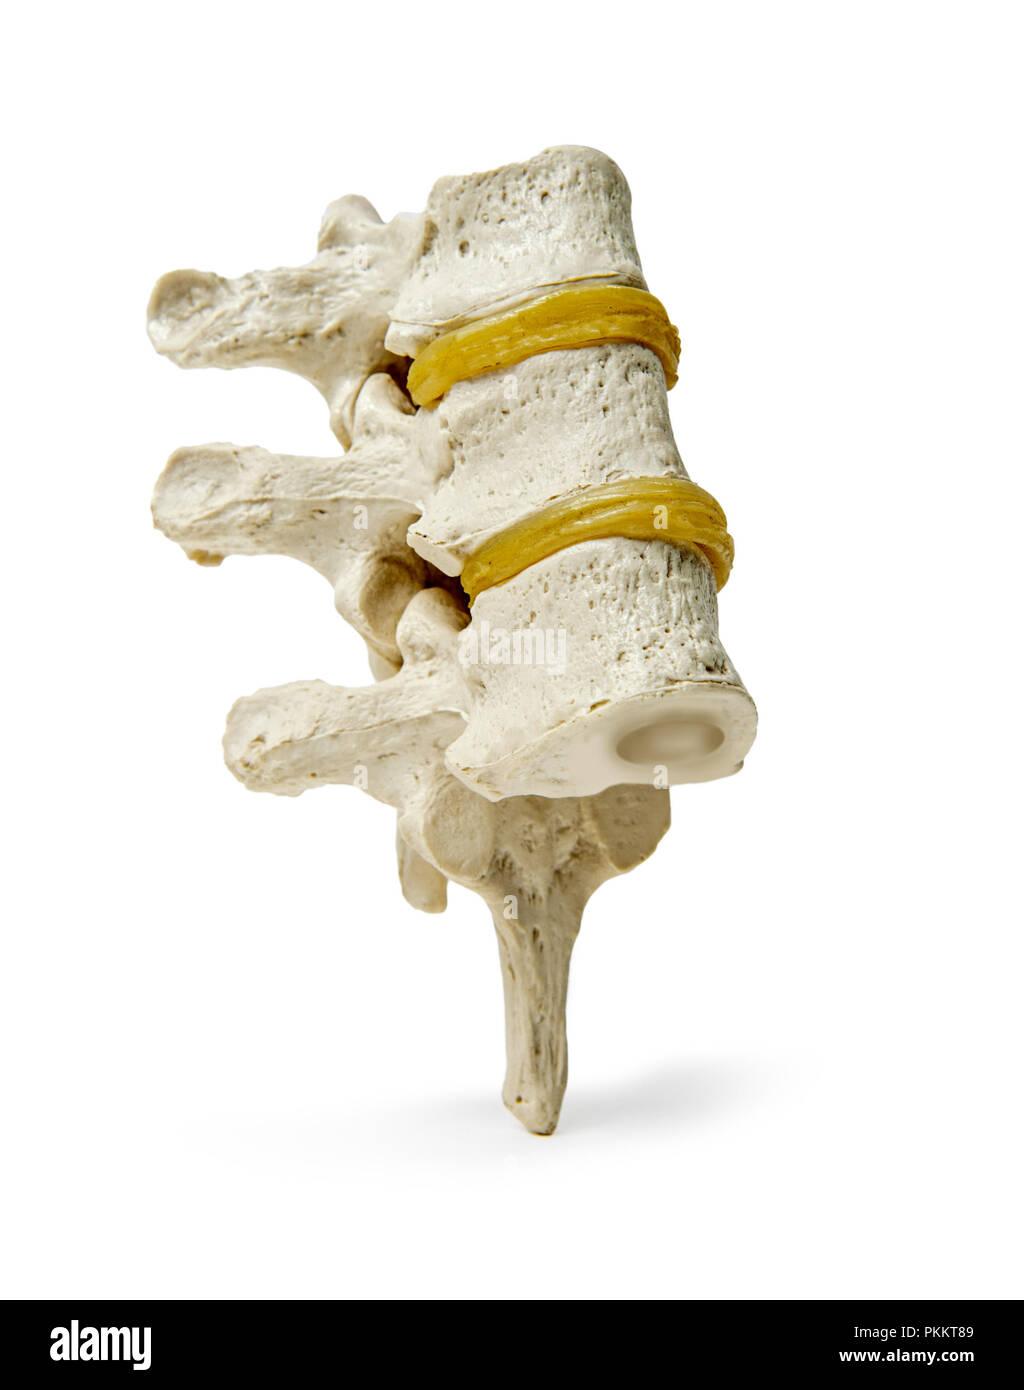 A model of three vertebra on white background. - Stock Image